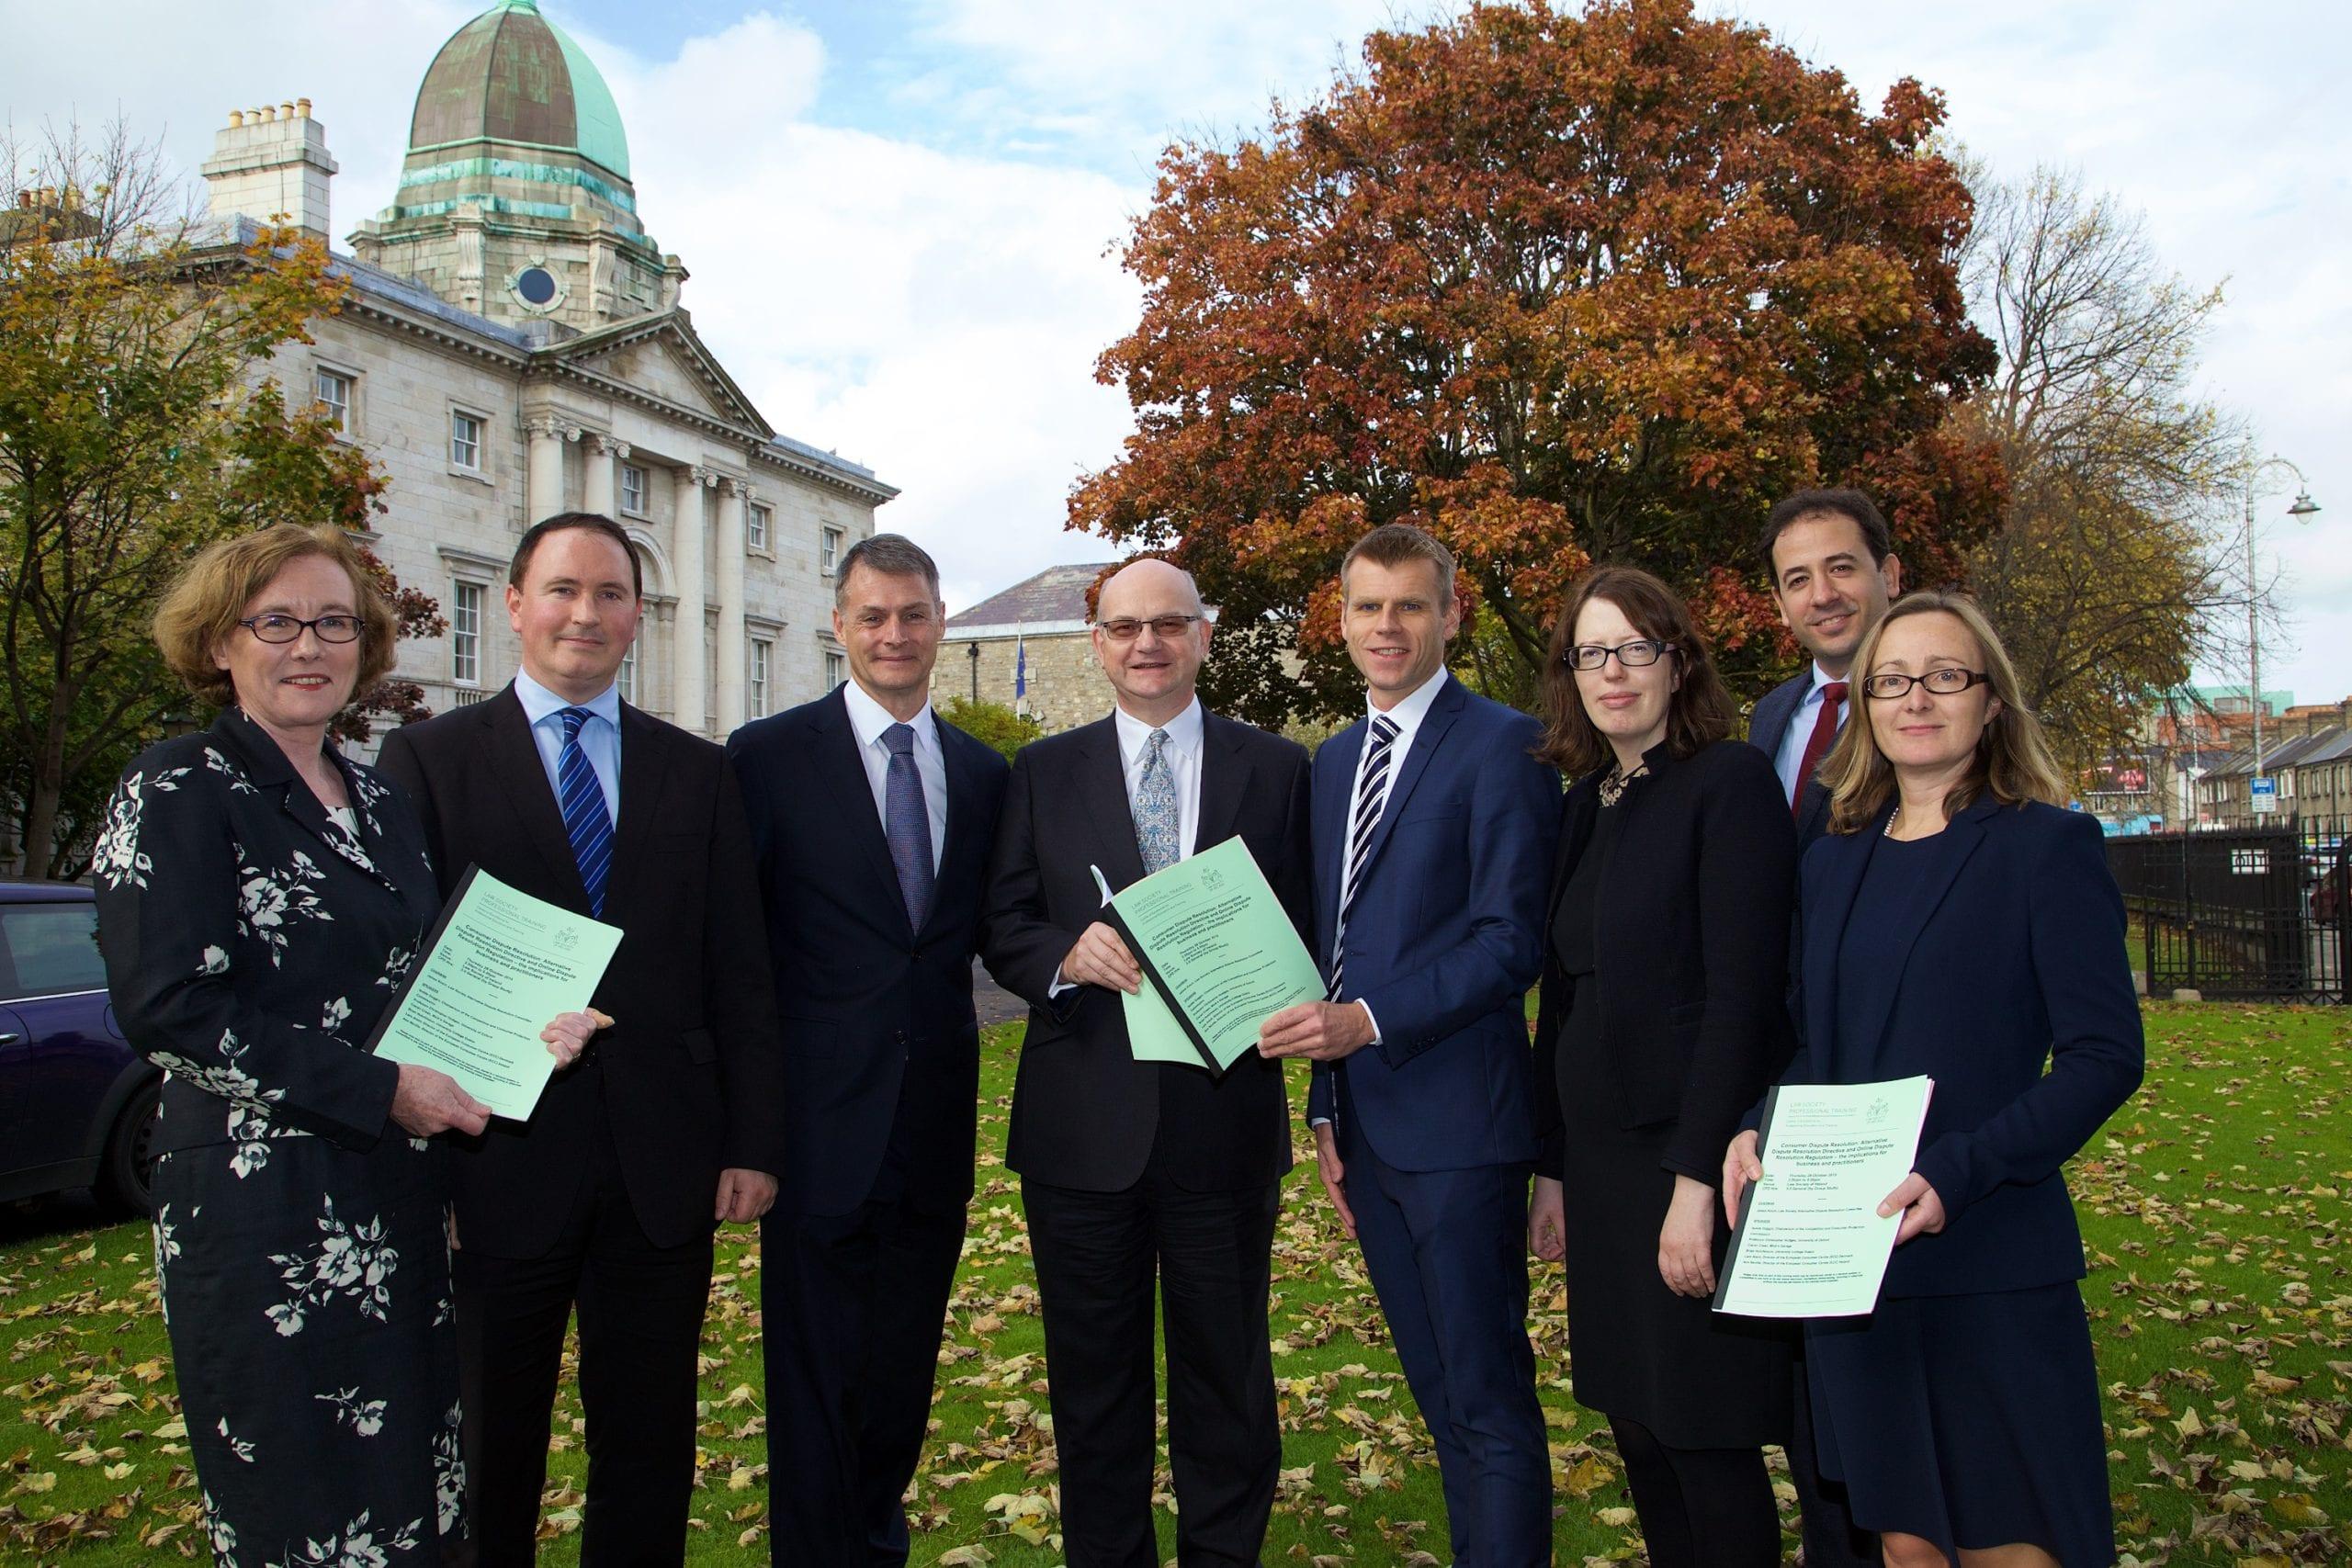 ECC Ireland ADR law society of Ireland 2015 annual report